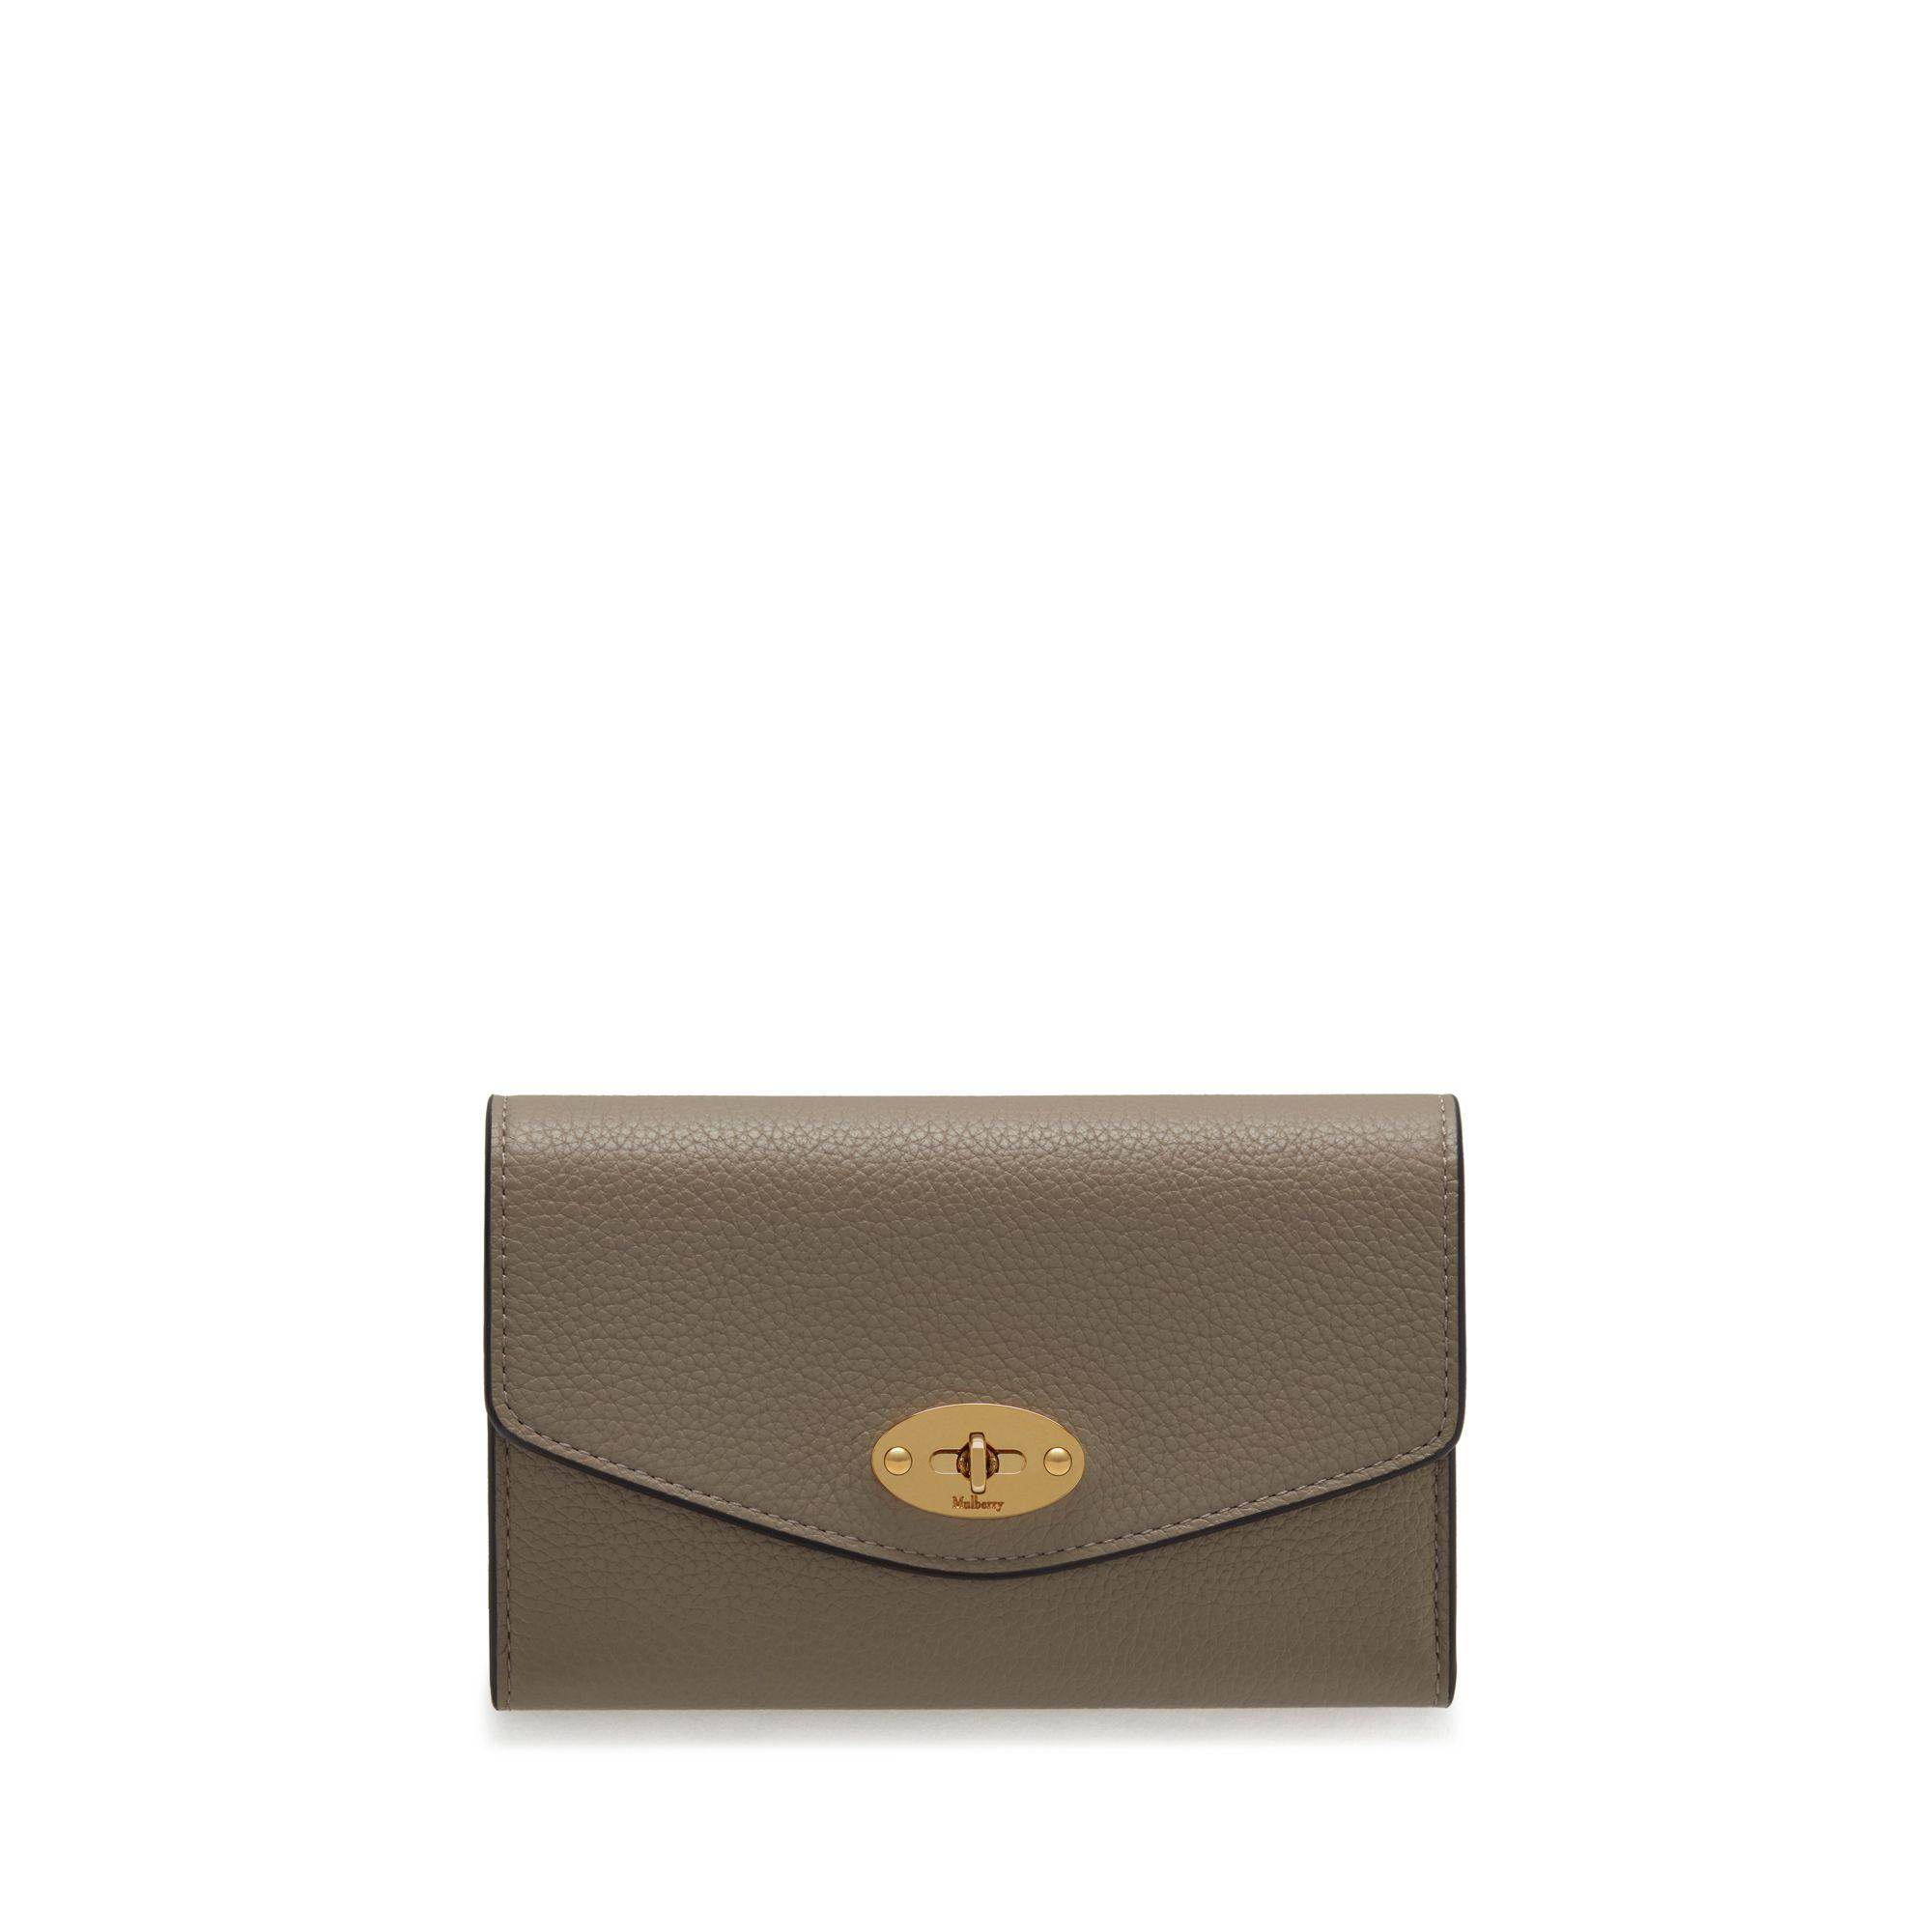 94fb0701b2 Mulberry - Gray Medium Darley Wallet In Solid Grey Small Classic Grain -  Lyst. View fullscreen